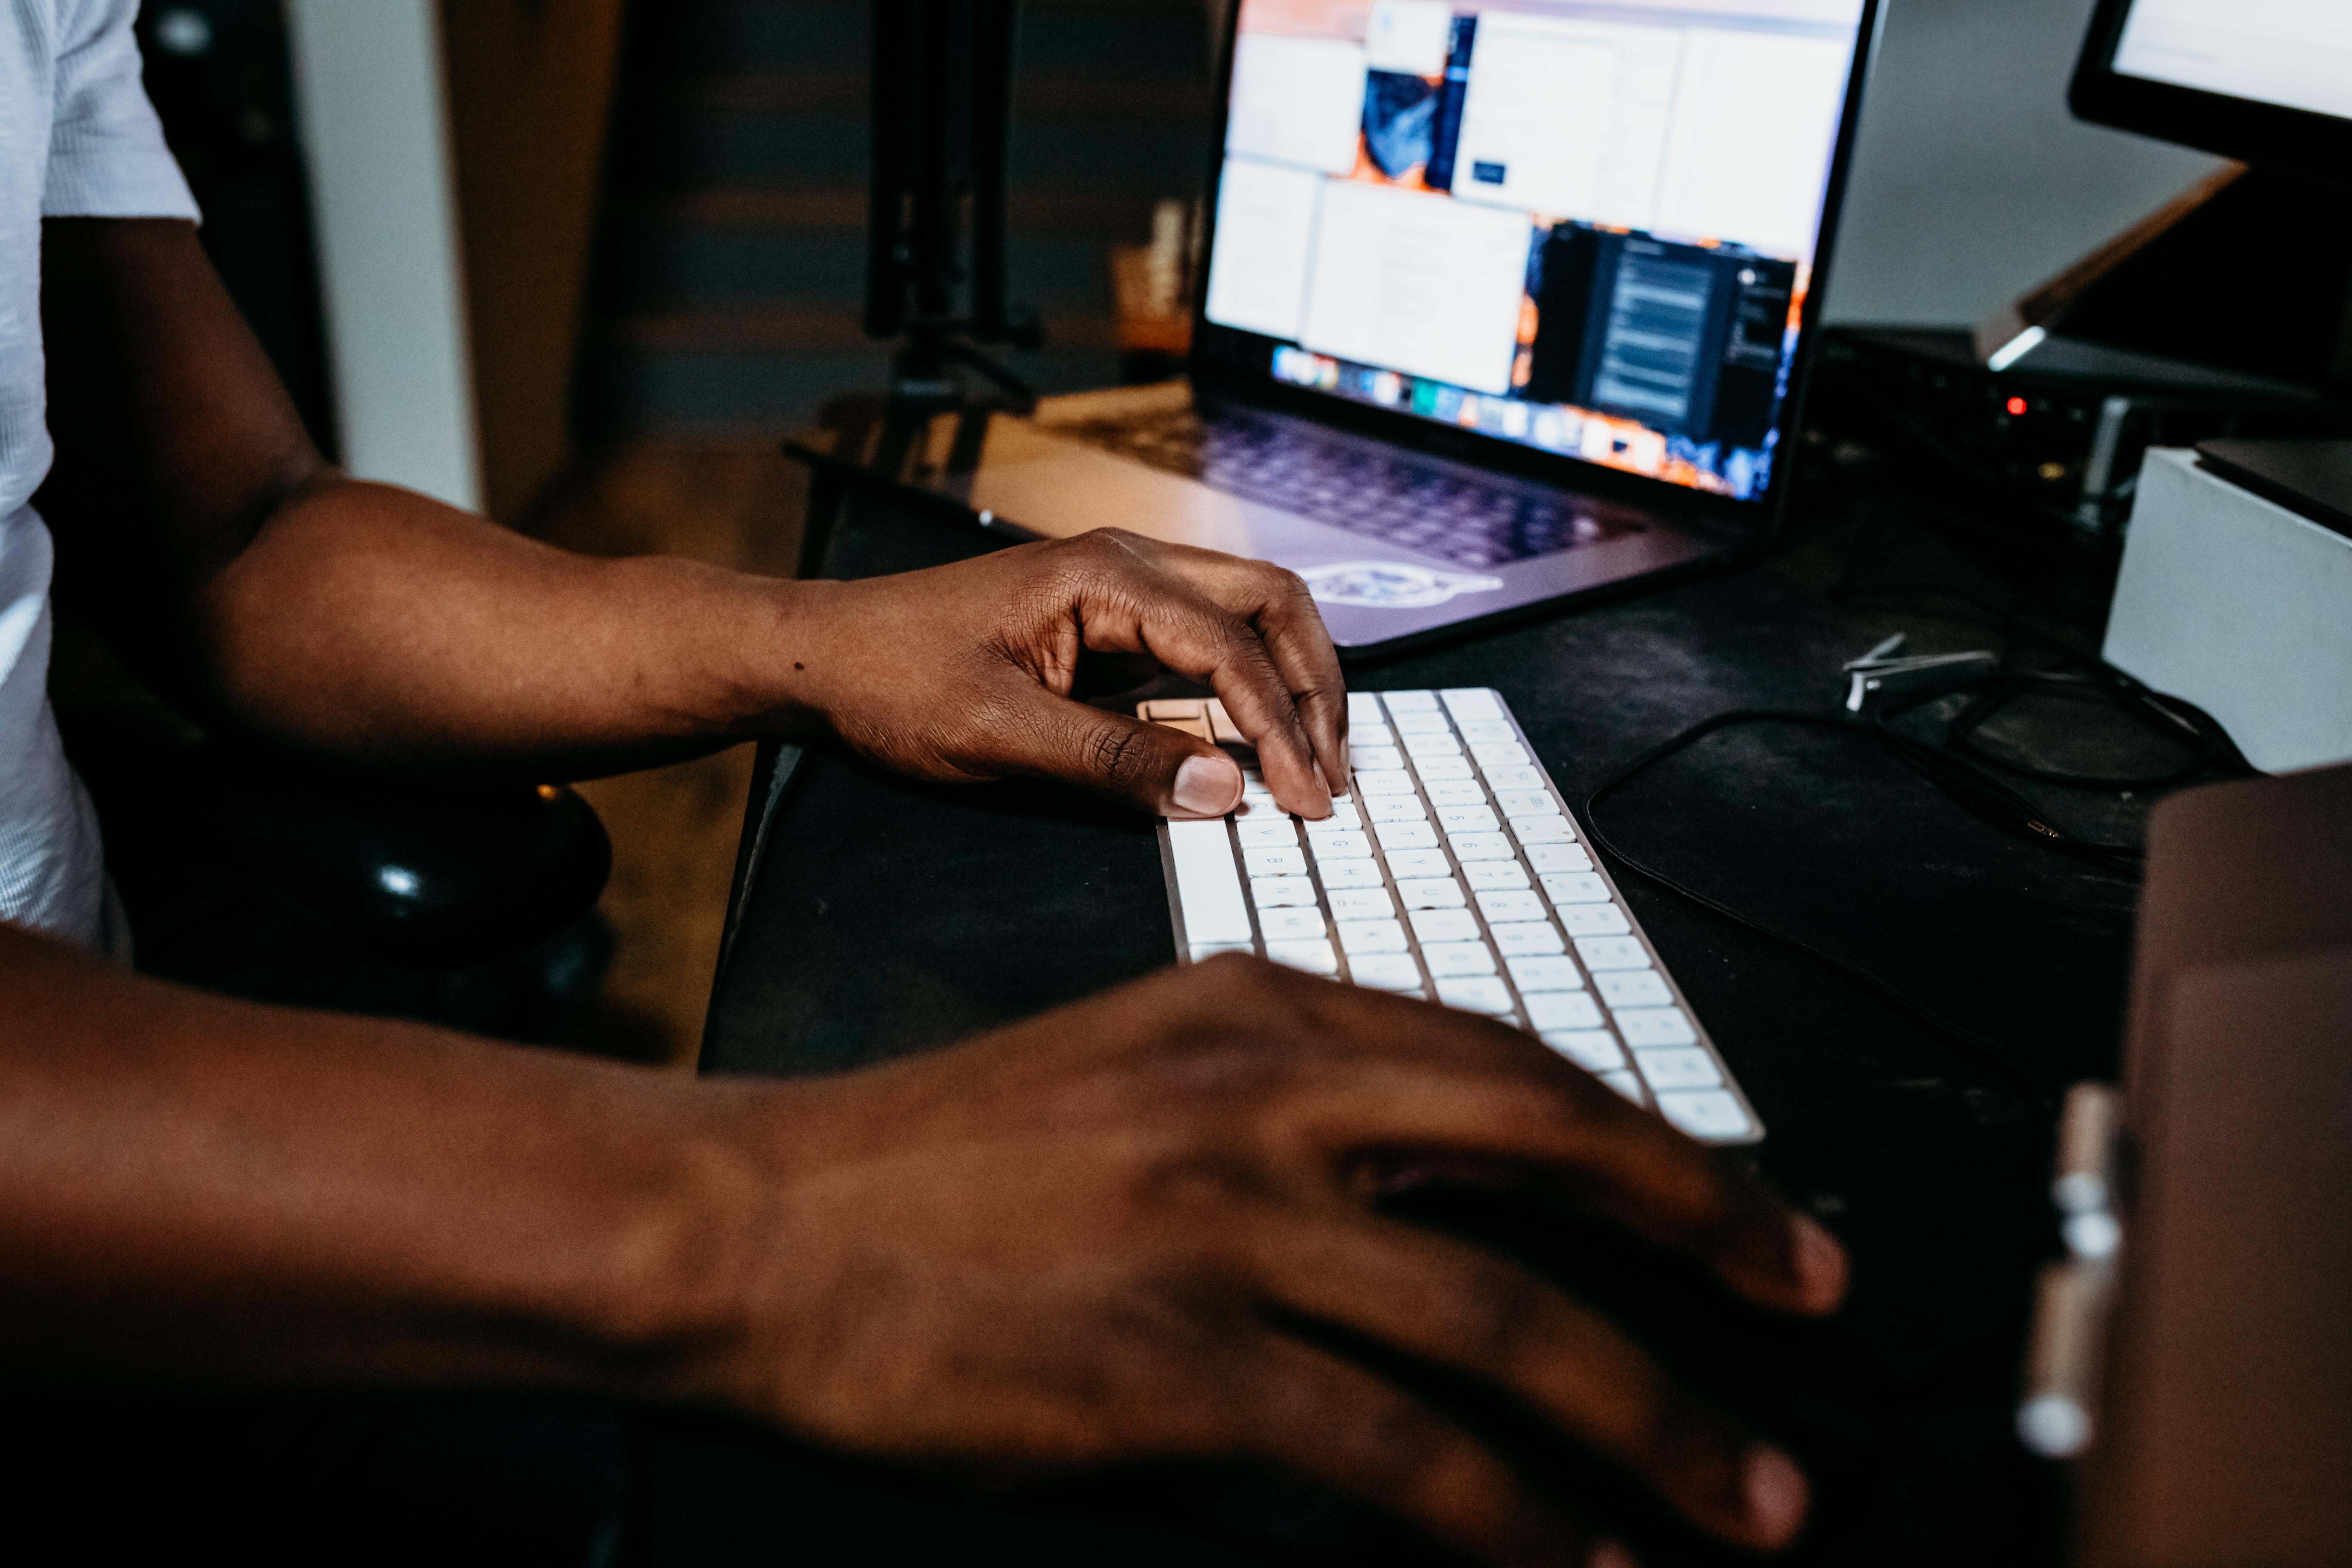 A man sits at a laptop.